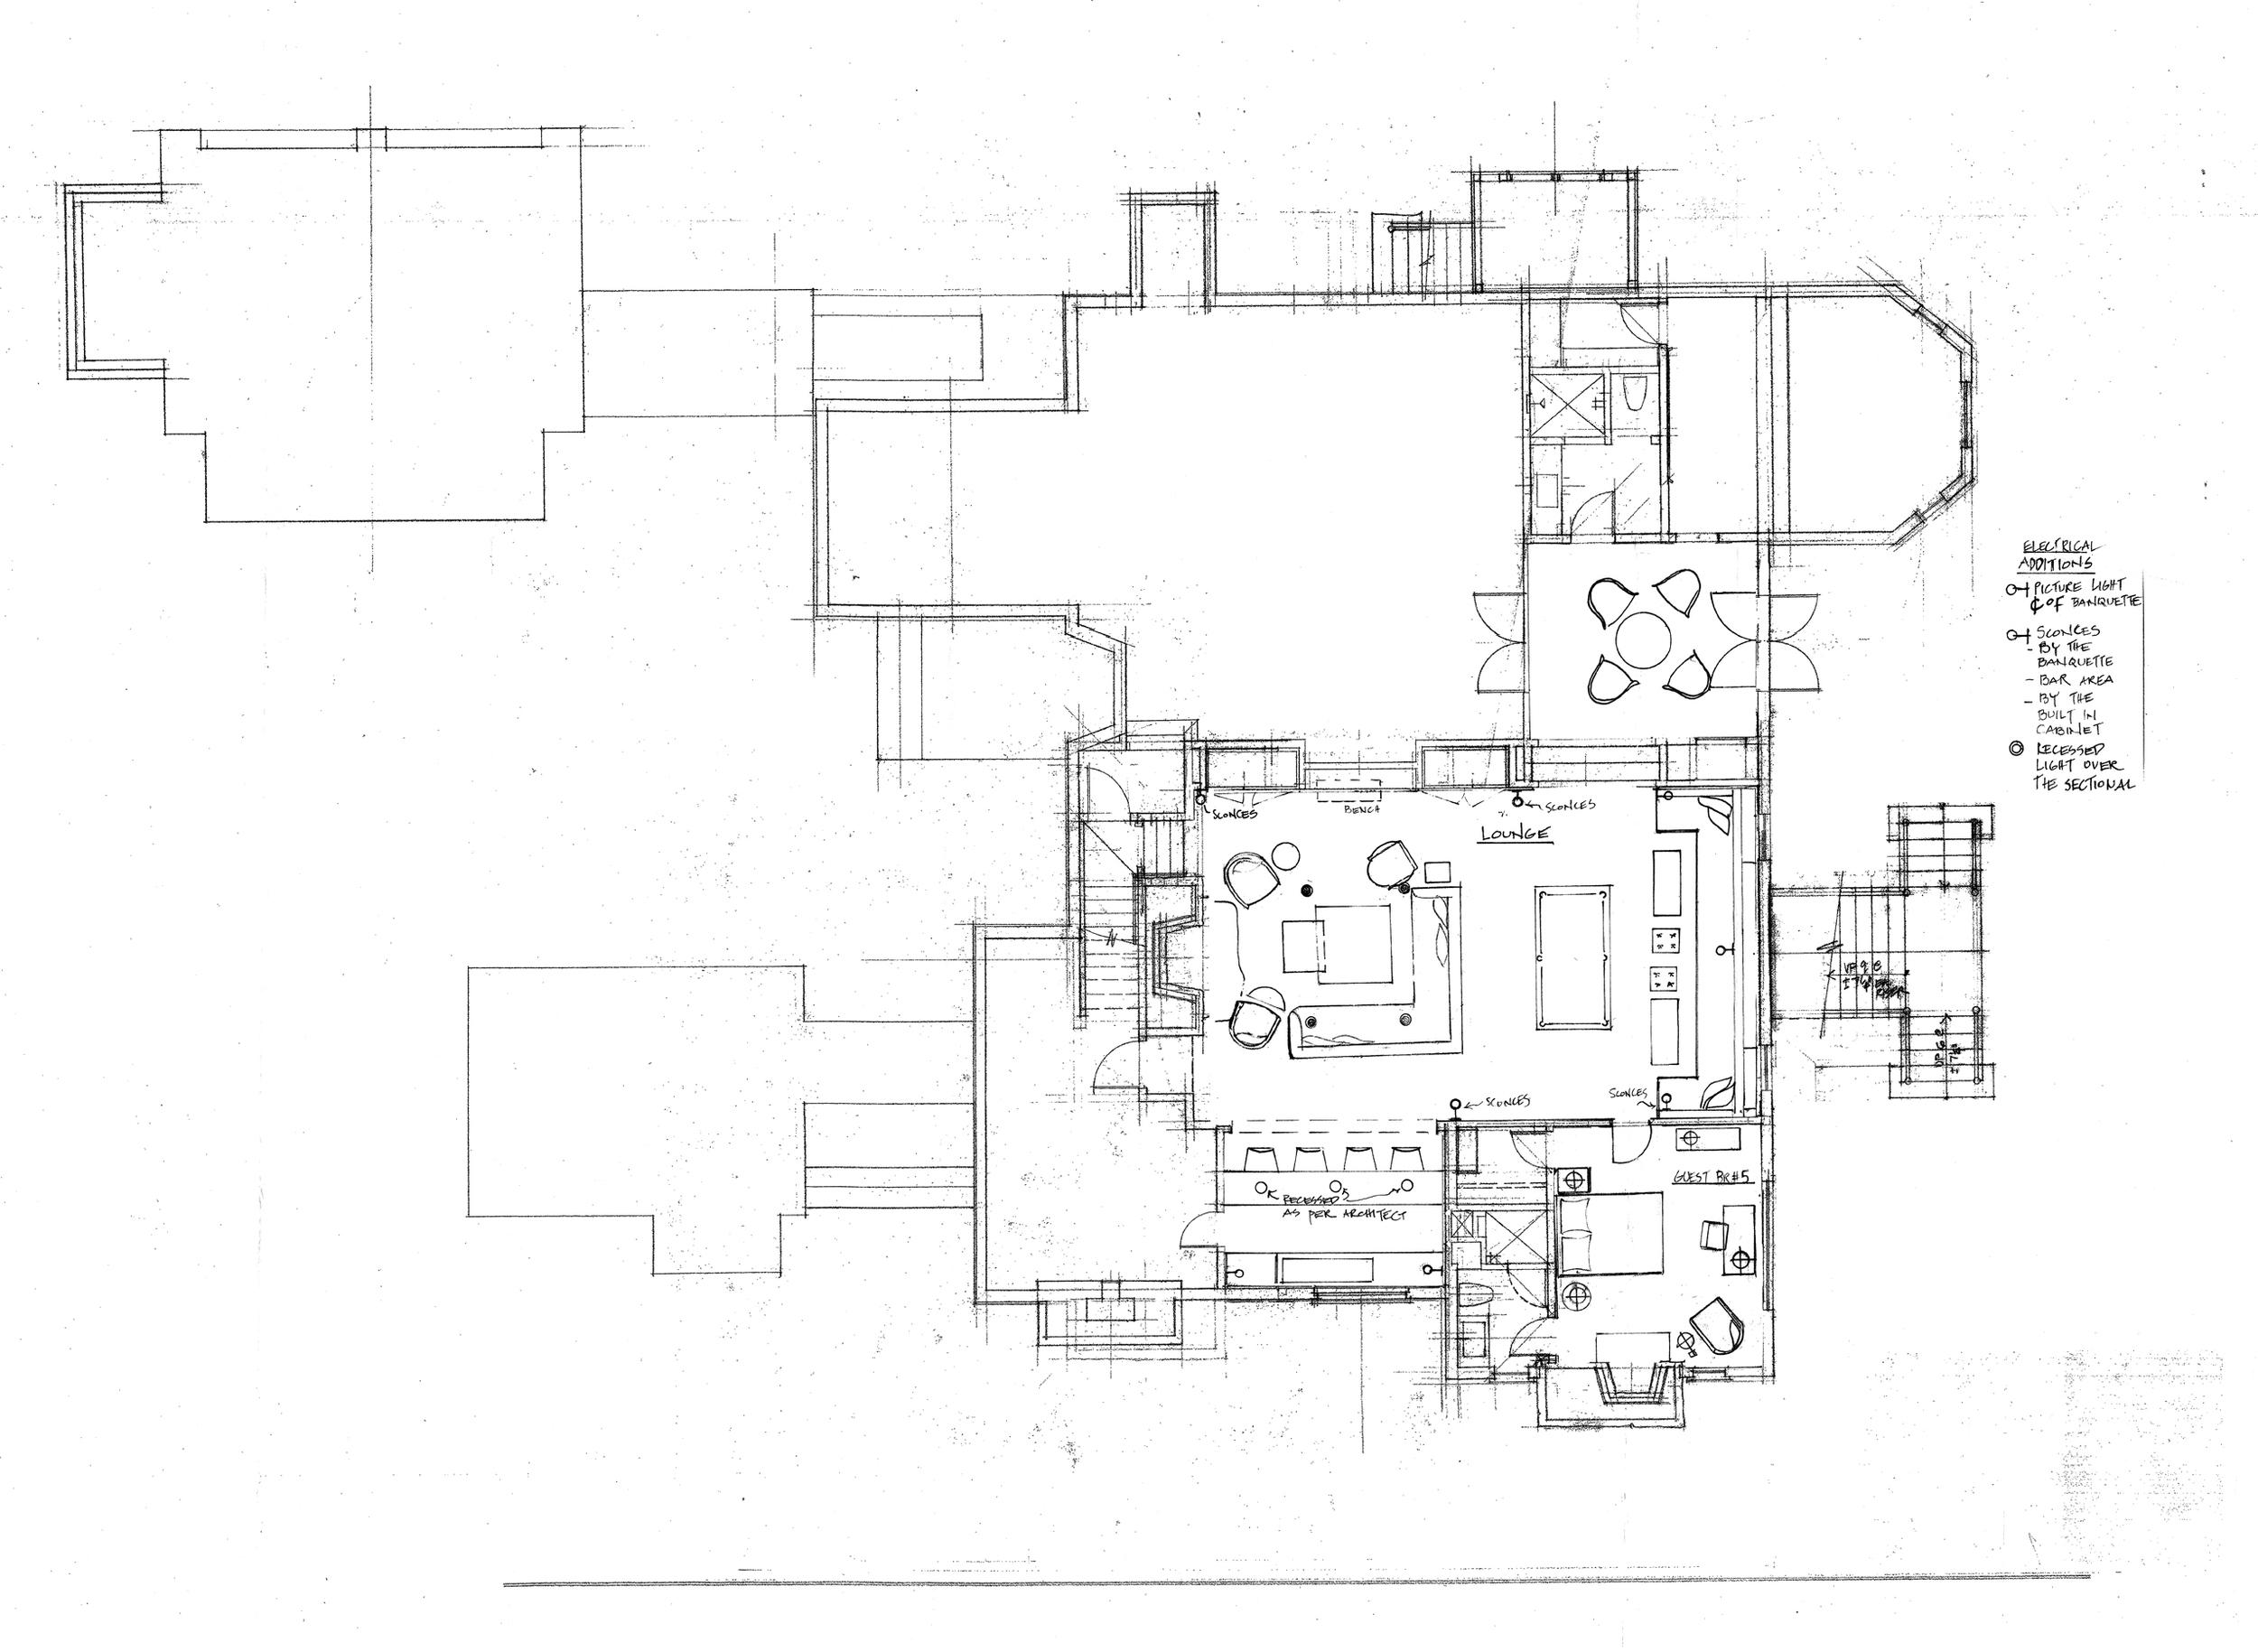 Lake_Placid.New_York.Lake_House.Robert_Orr_&_Associates.Architecture.Landscape_Architecture.Urbanism.Camp.Plan3_Lower_Level.Barnes.jpg